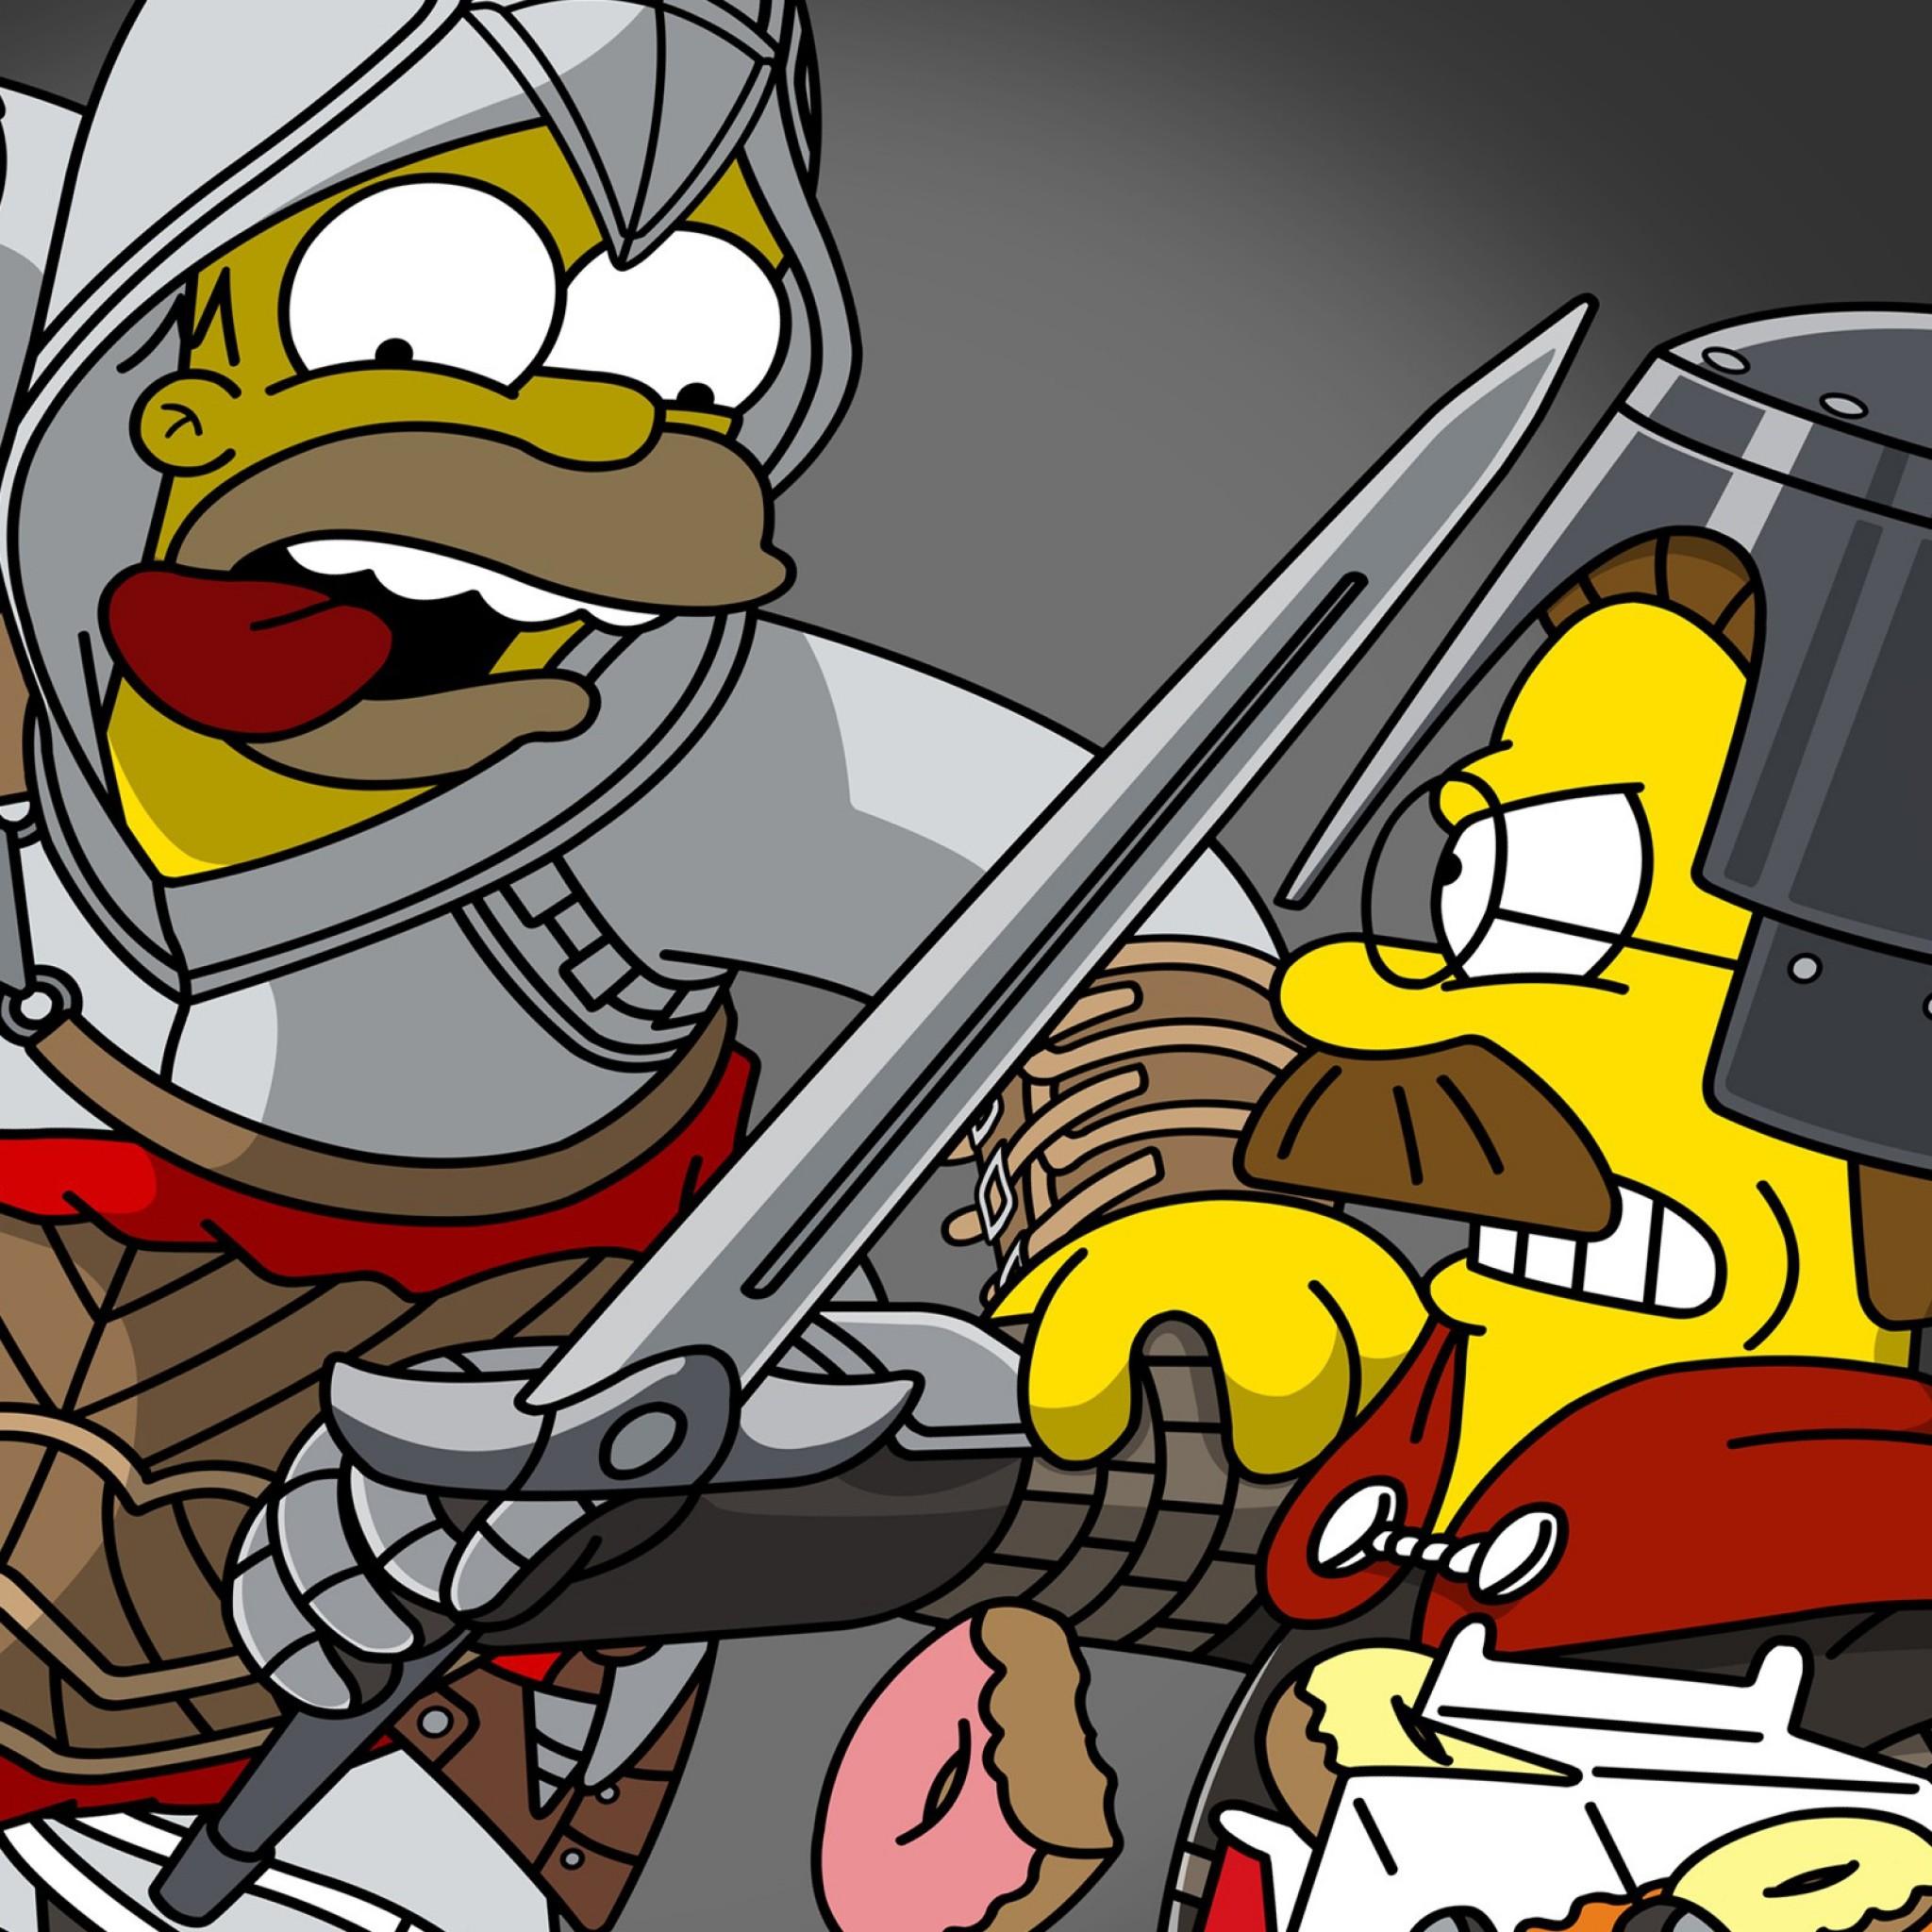 The Simpsons Wallpaper for Desktop (68+ images)